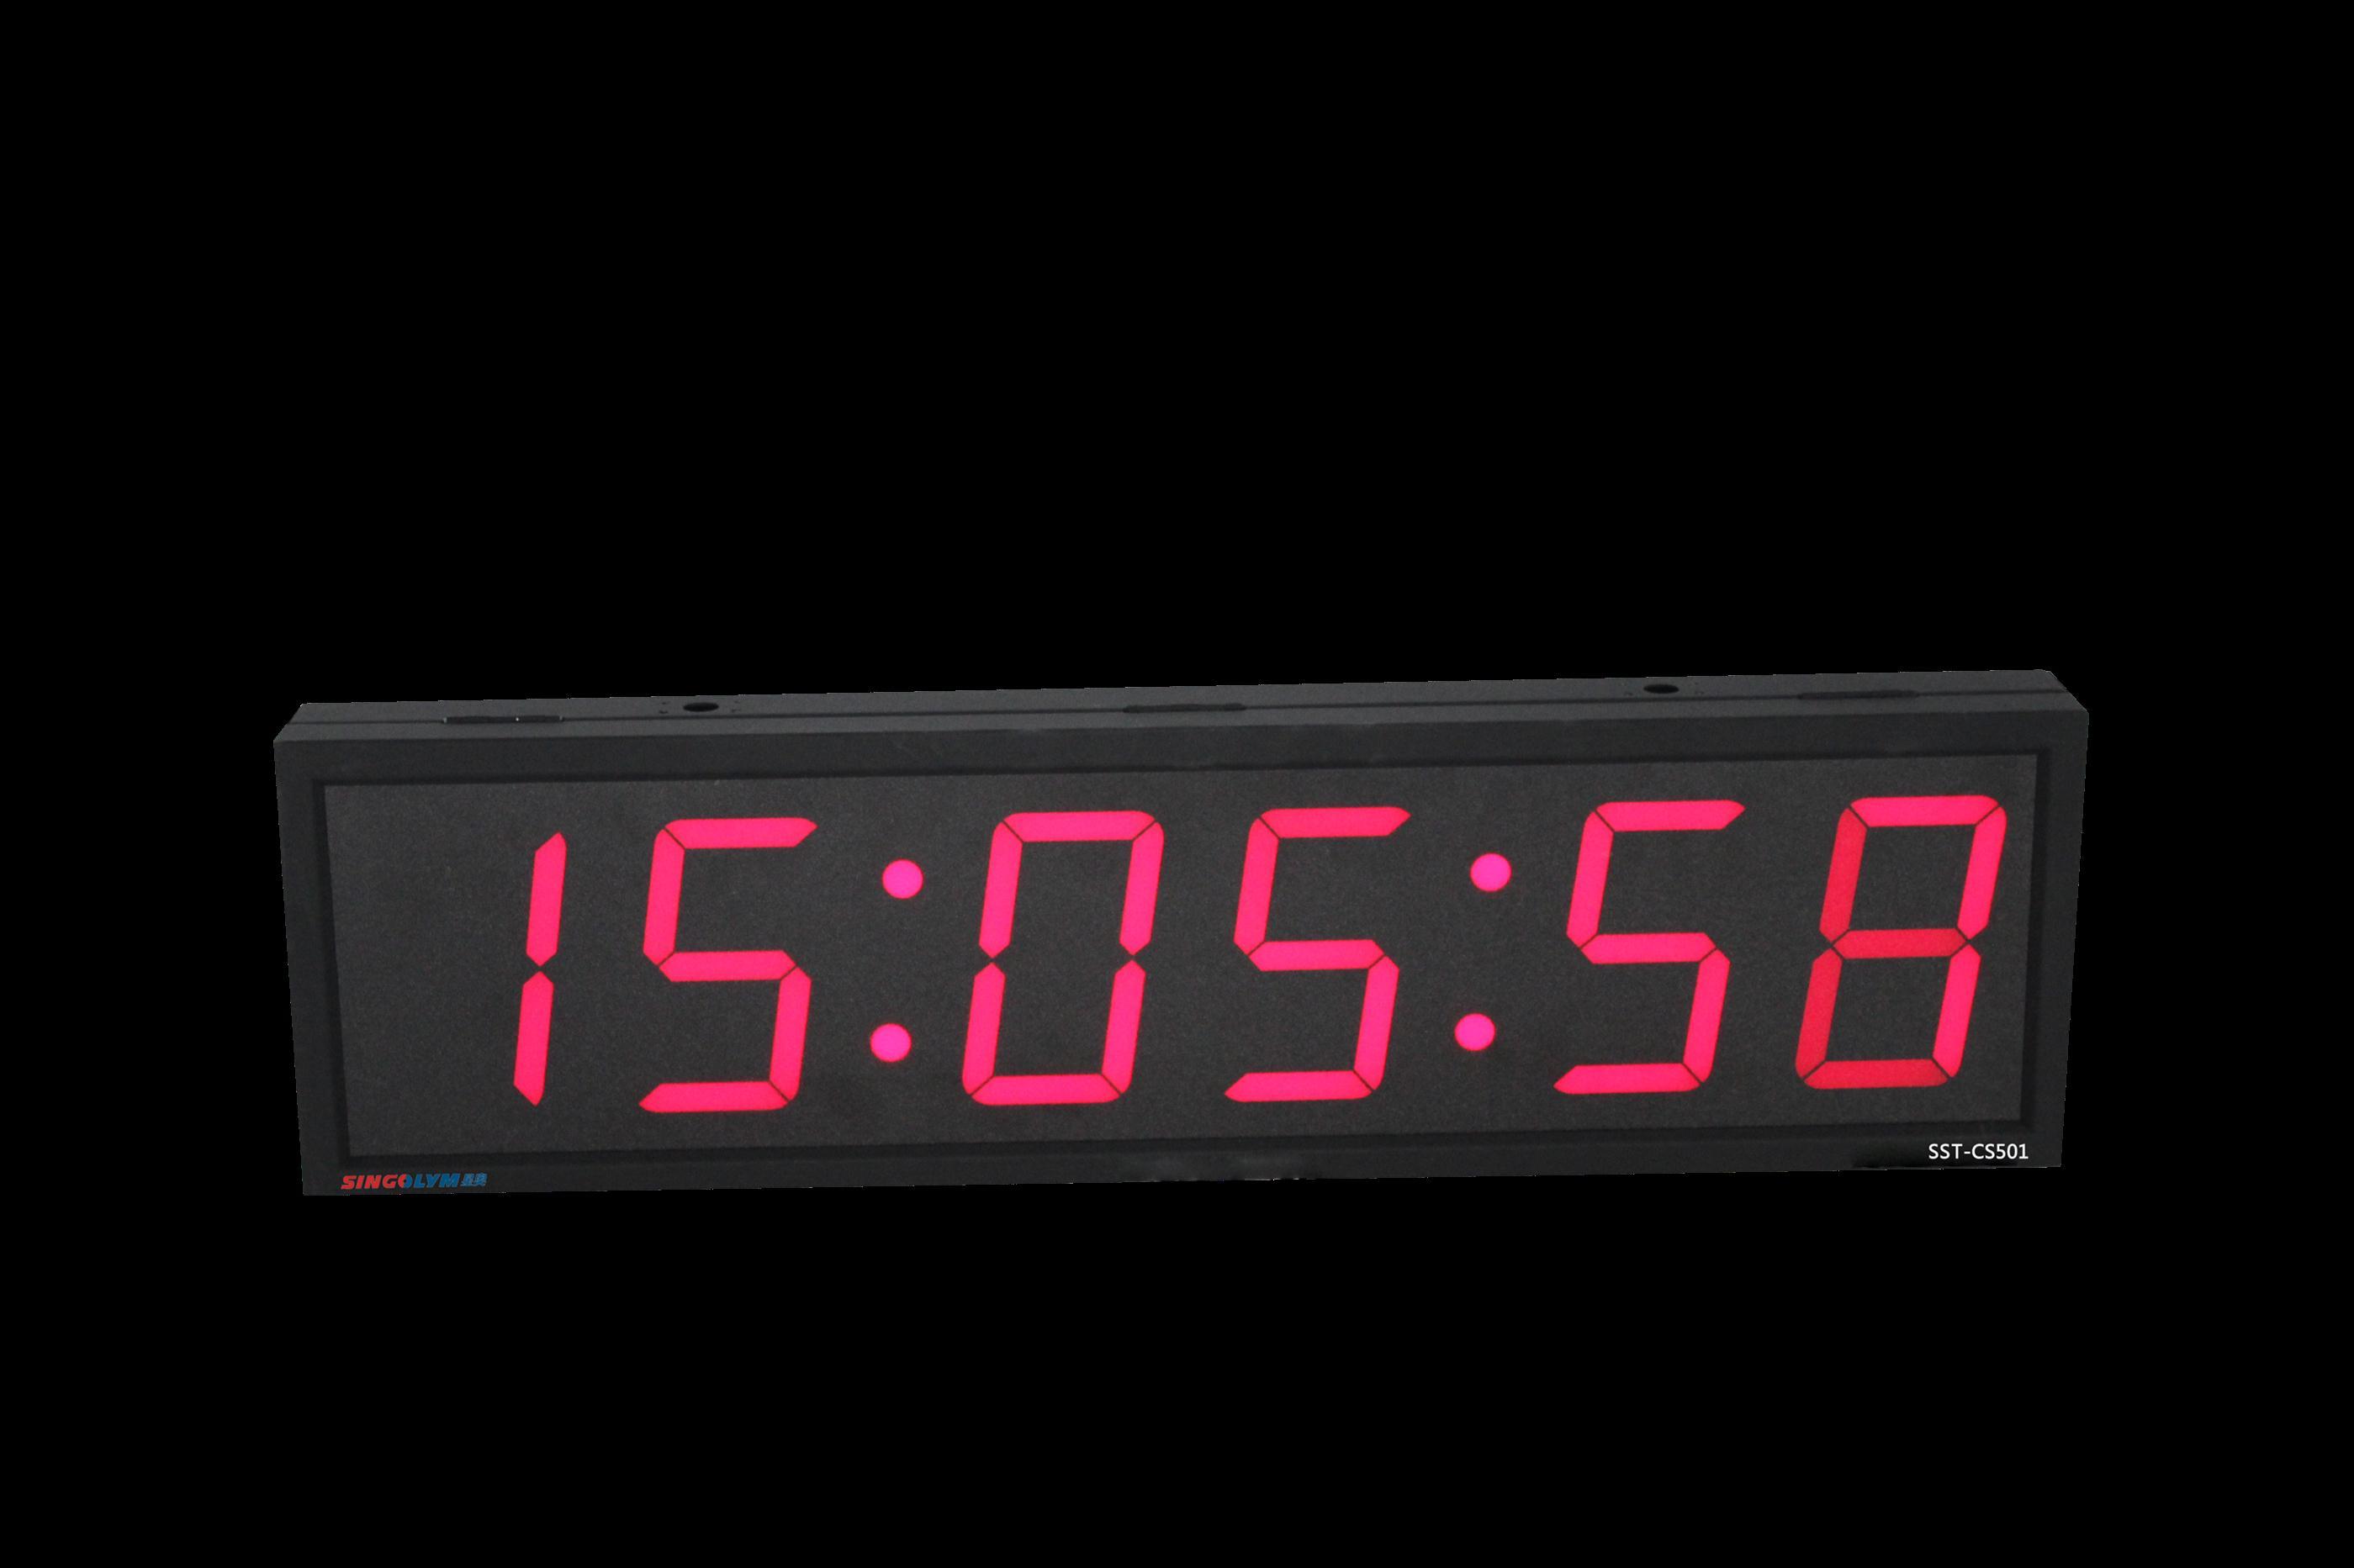 许昌GPS标准时钟电话